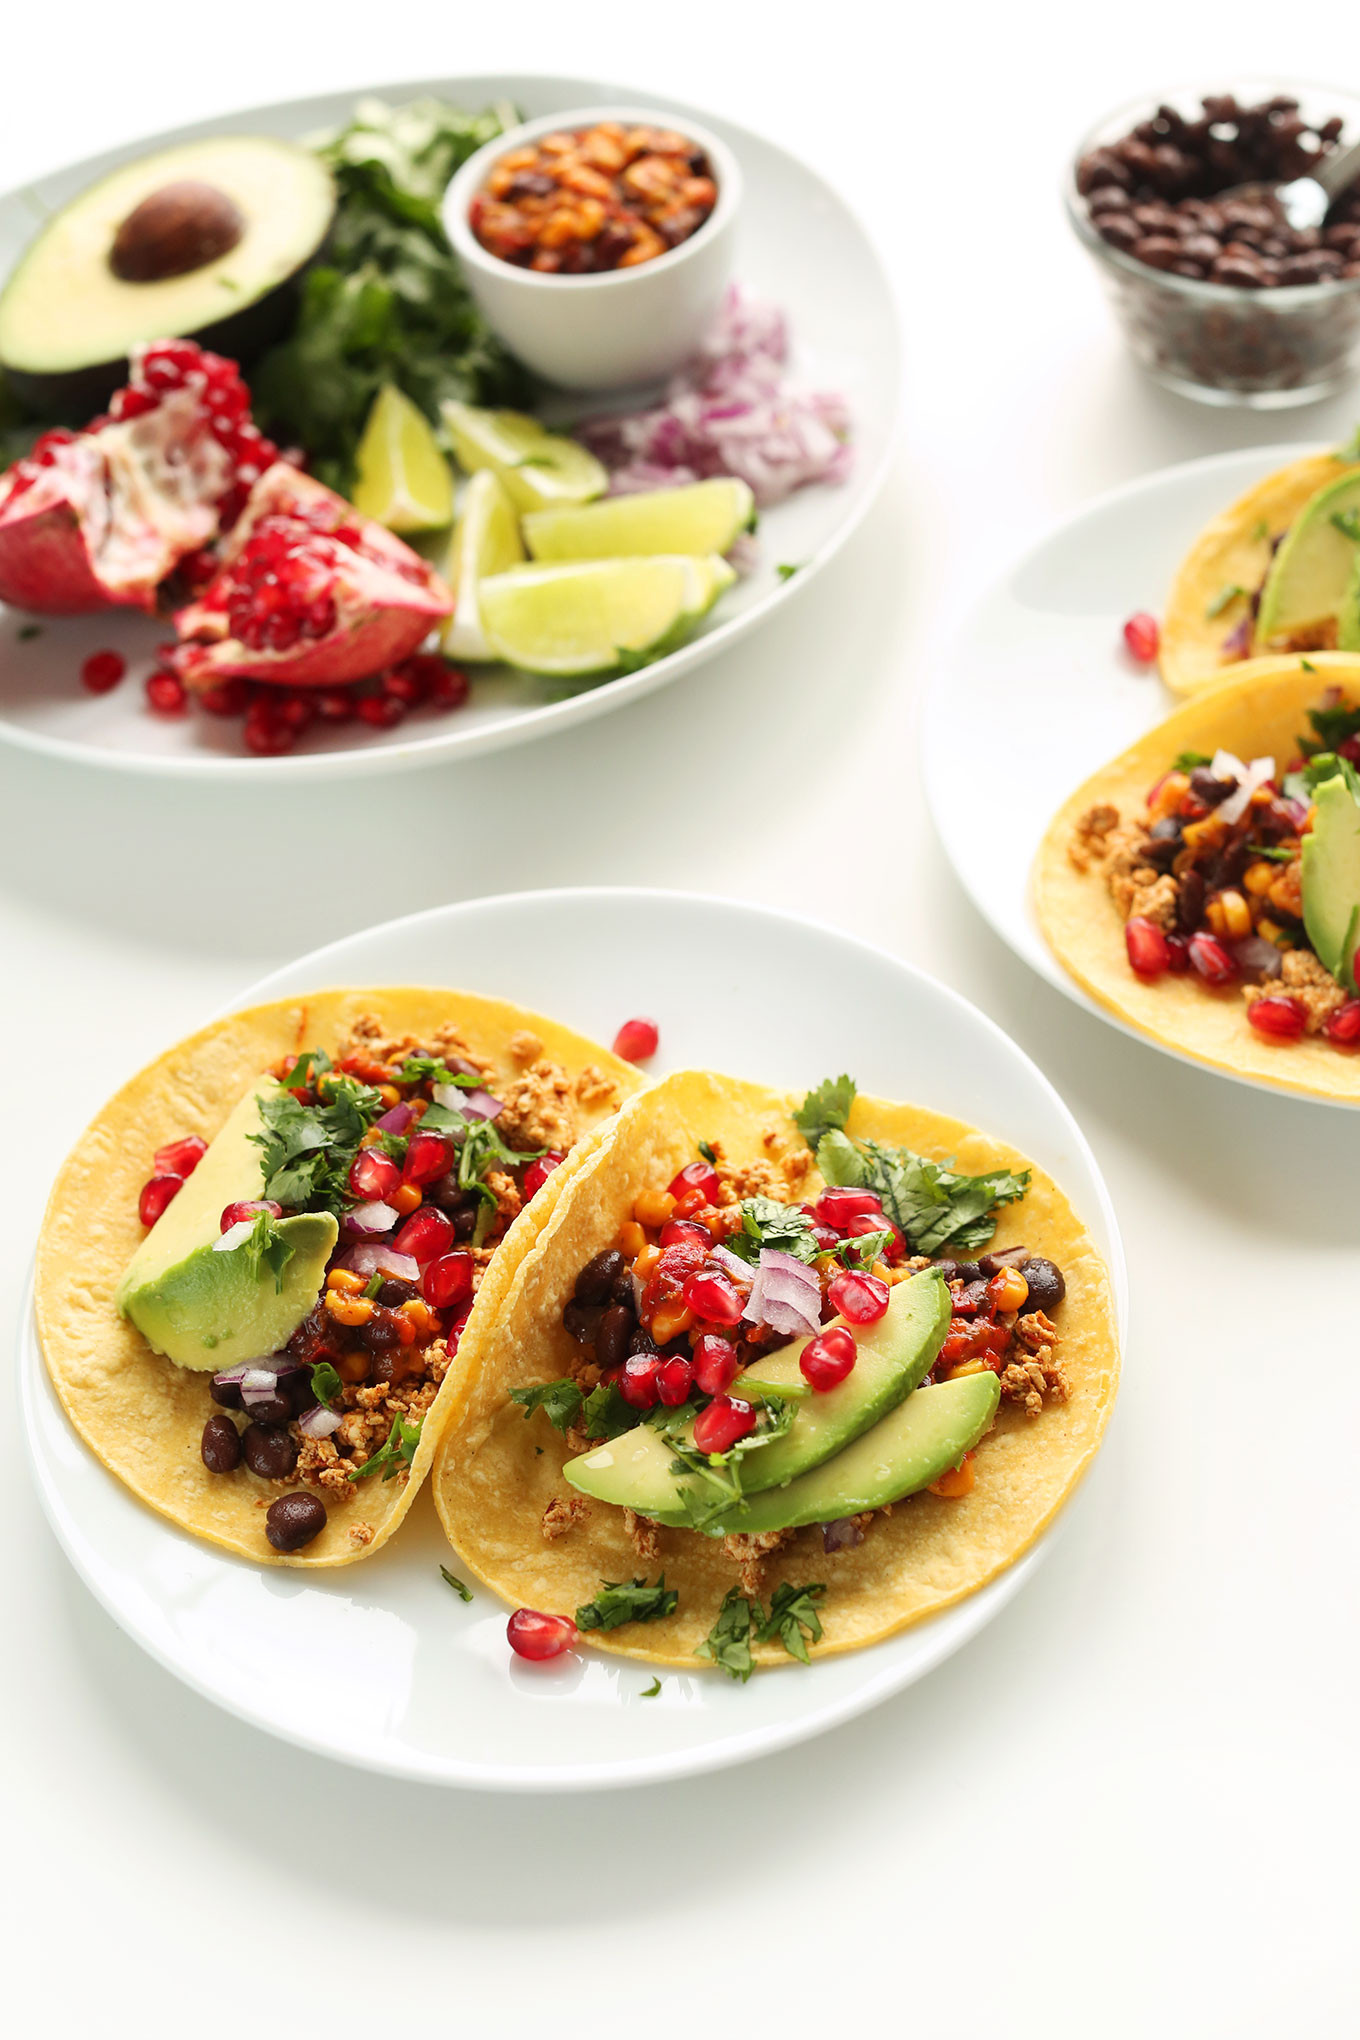 Easy Vegan Breakfast Healthy  Vegan Breakfast Tacos